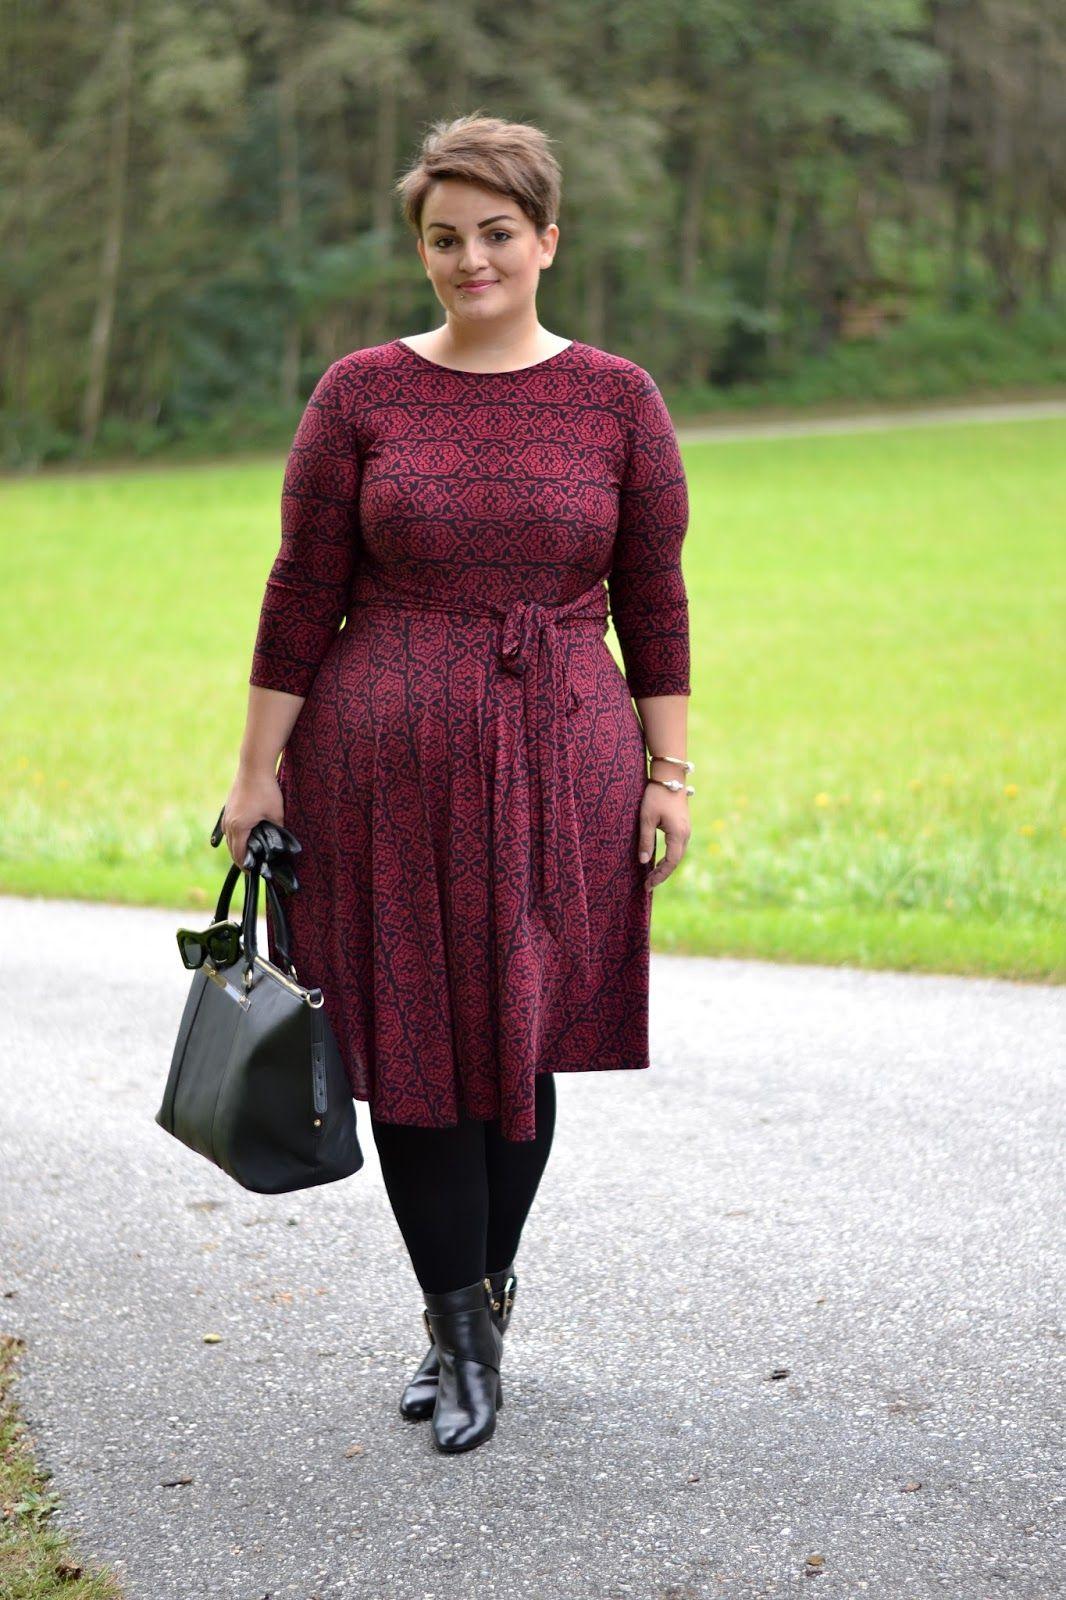 8c25b219f5093 Plus Size Fashion for Women - Curvy Claudia: The Katharine Dress ...